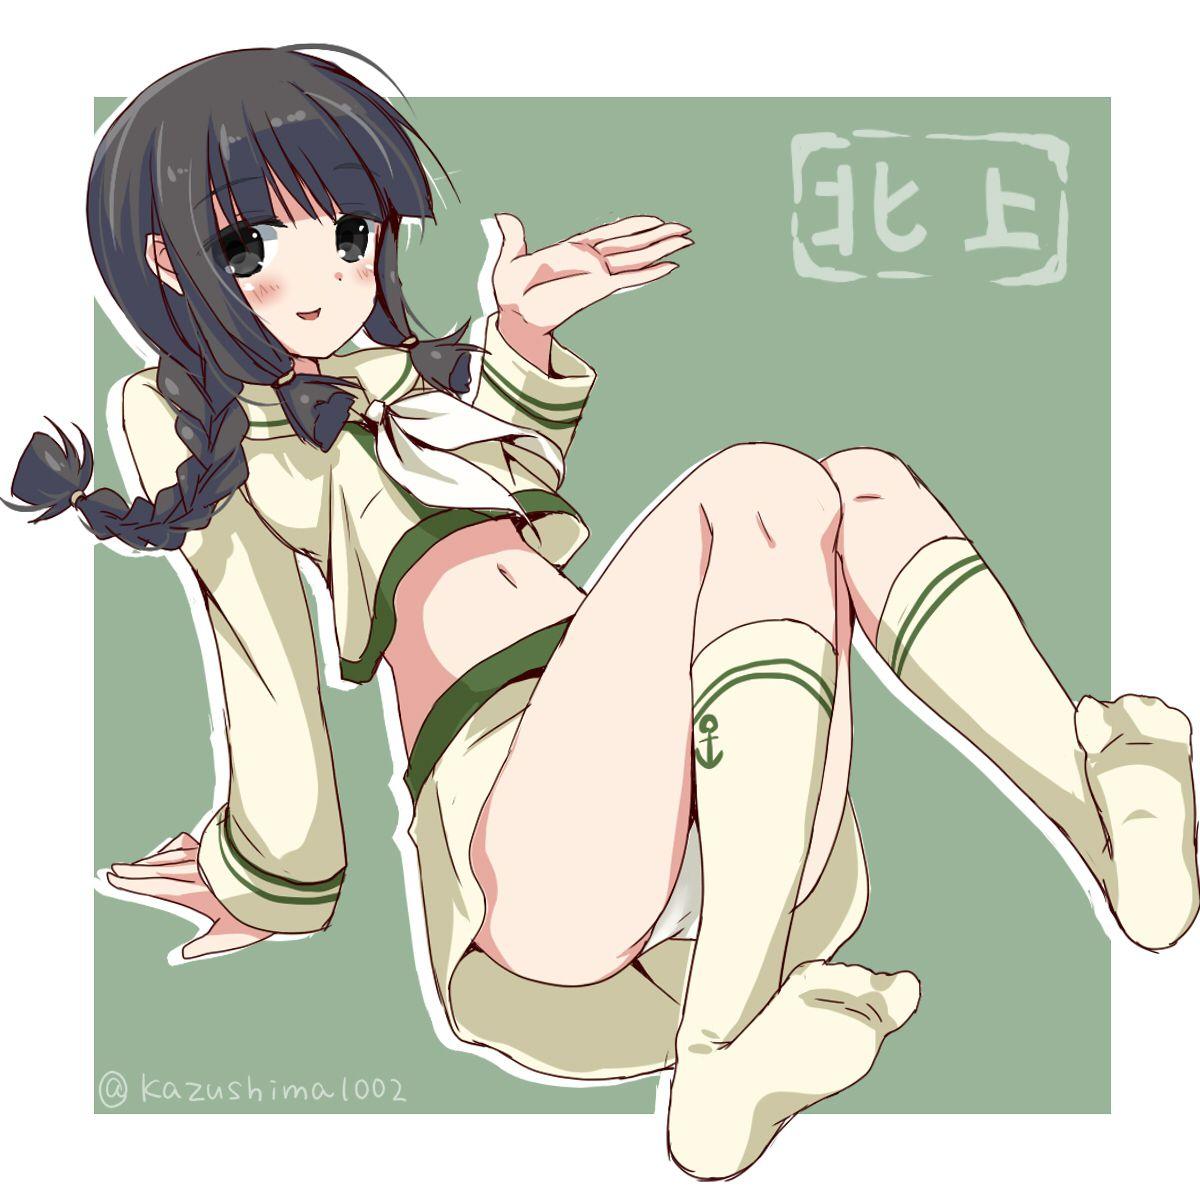 kitakami_(kantai_collection)055